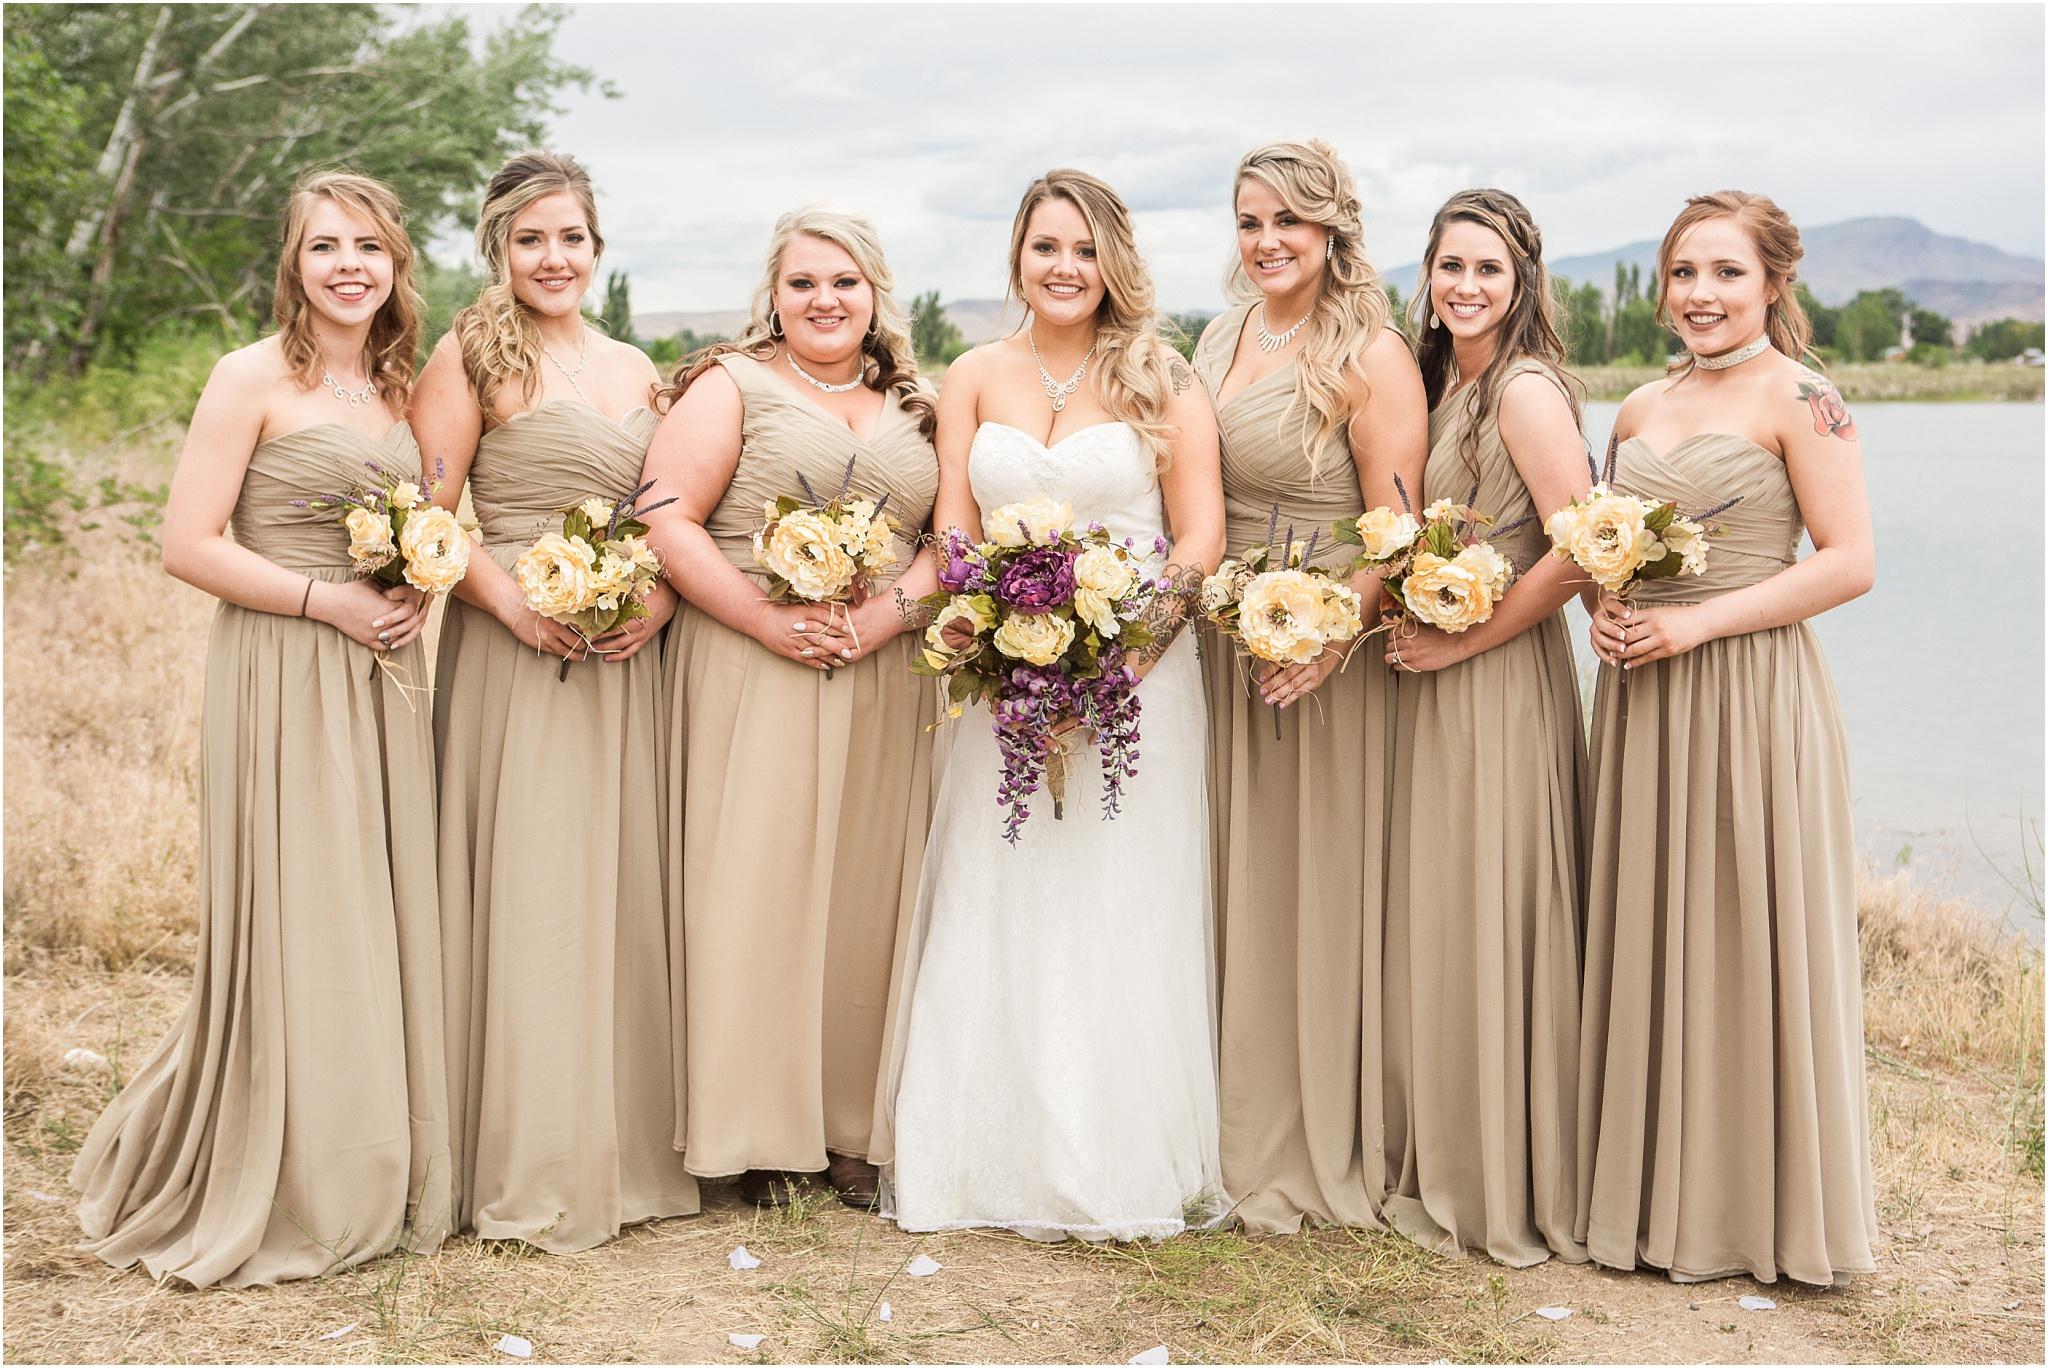 Wedding Photography_Emmett Idaho_Boise Idaho_Leah Southwick Photography_0054.jpg